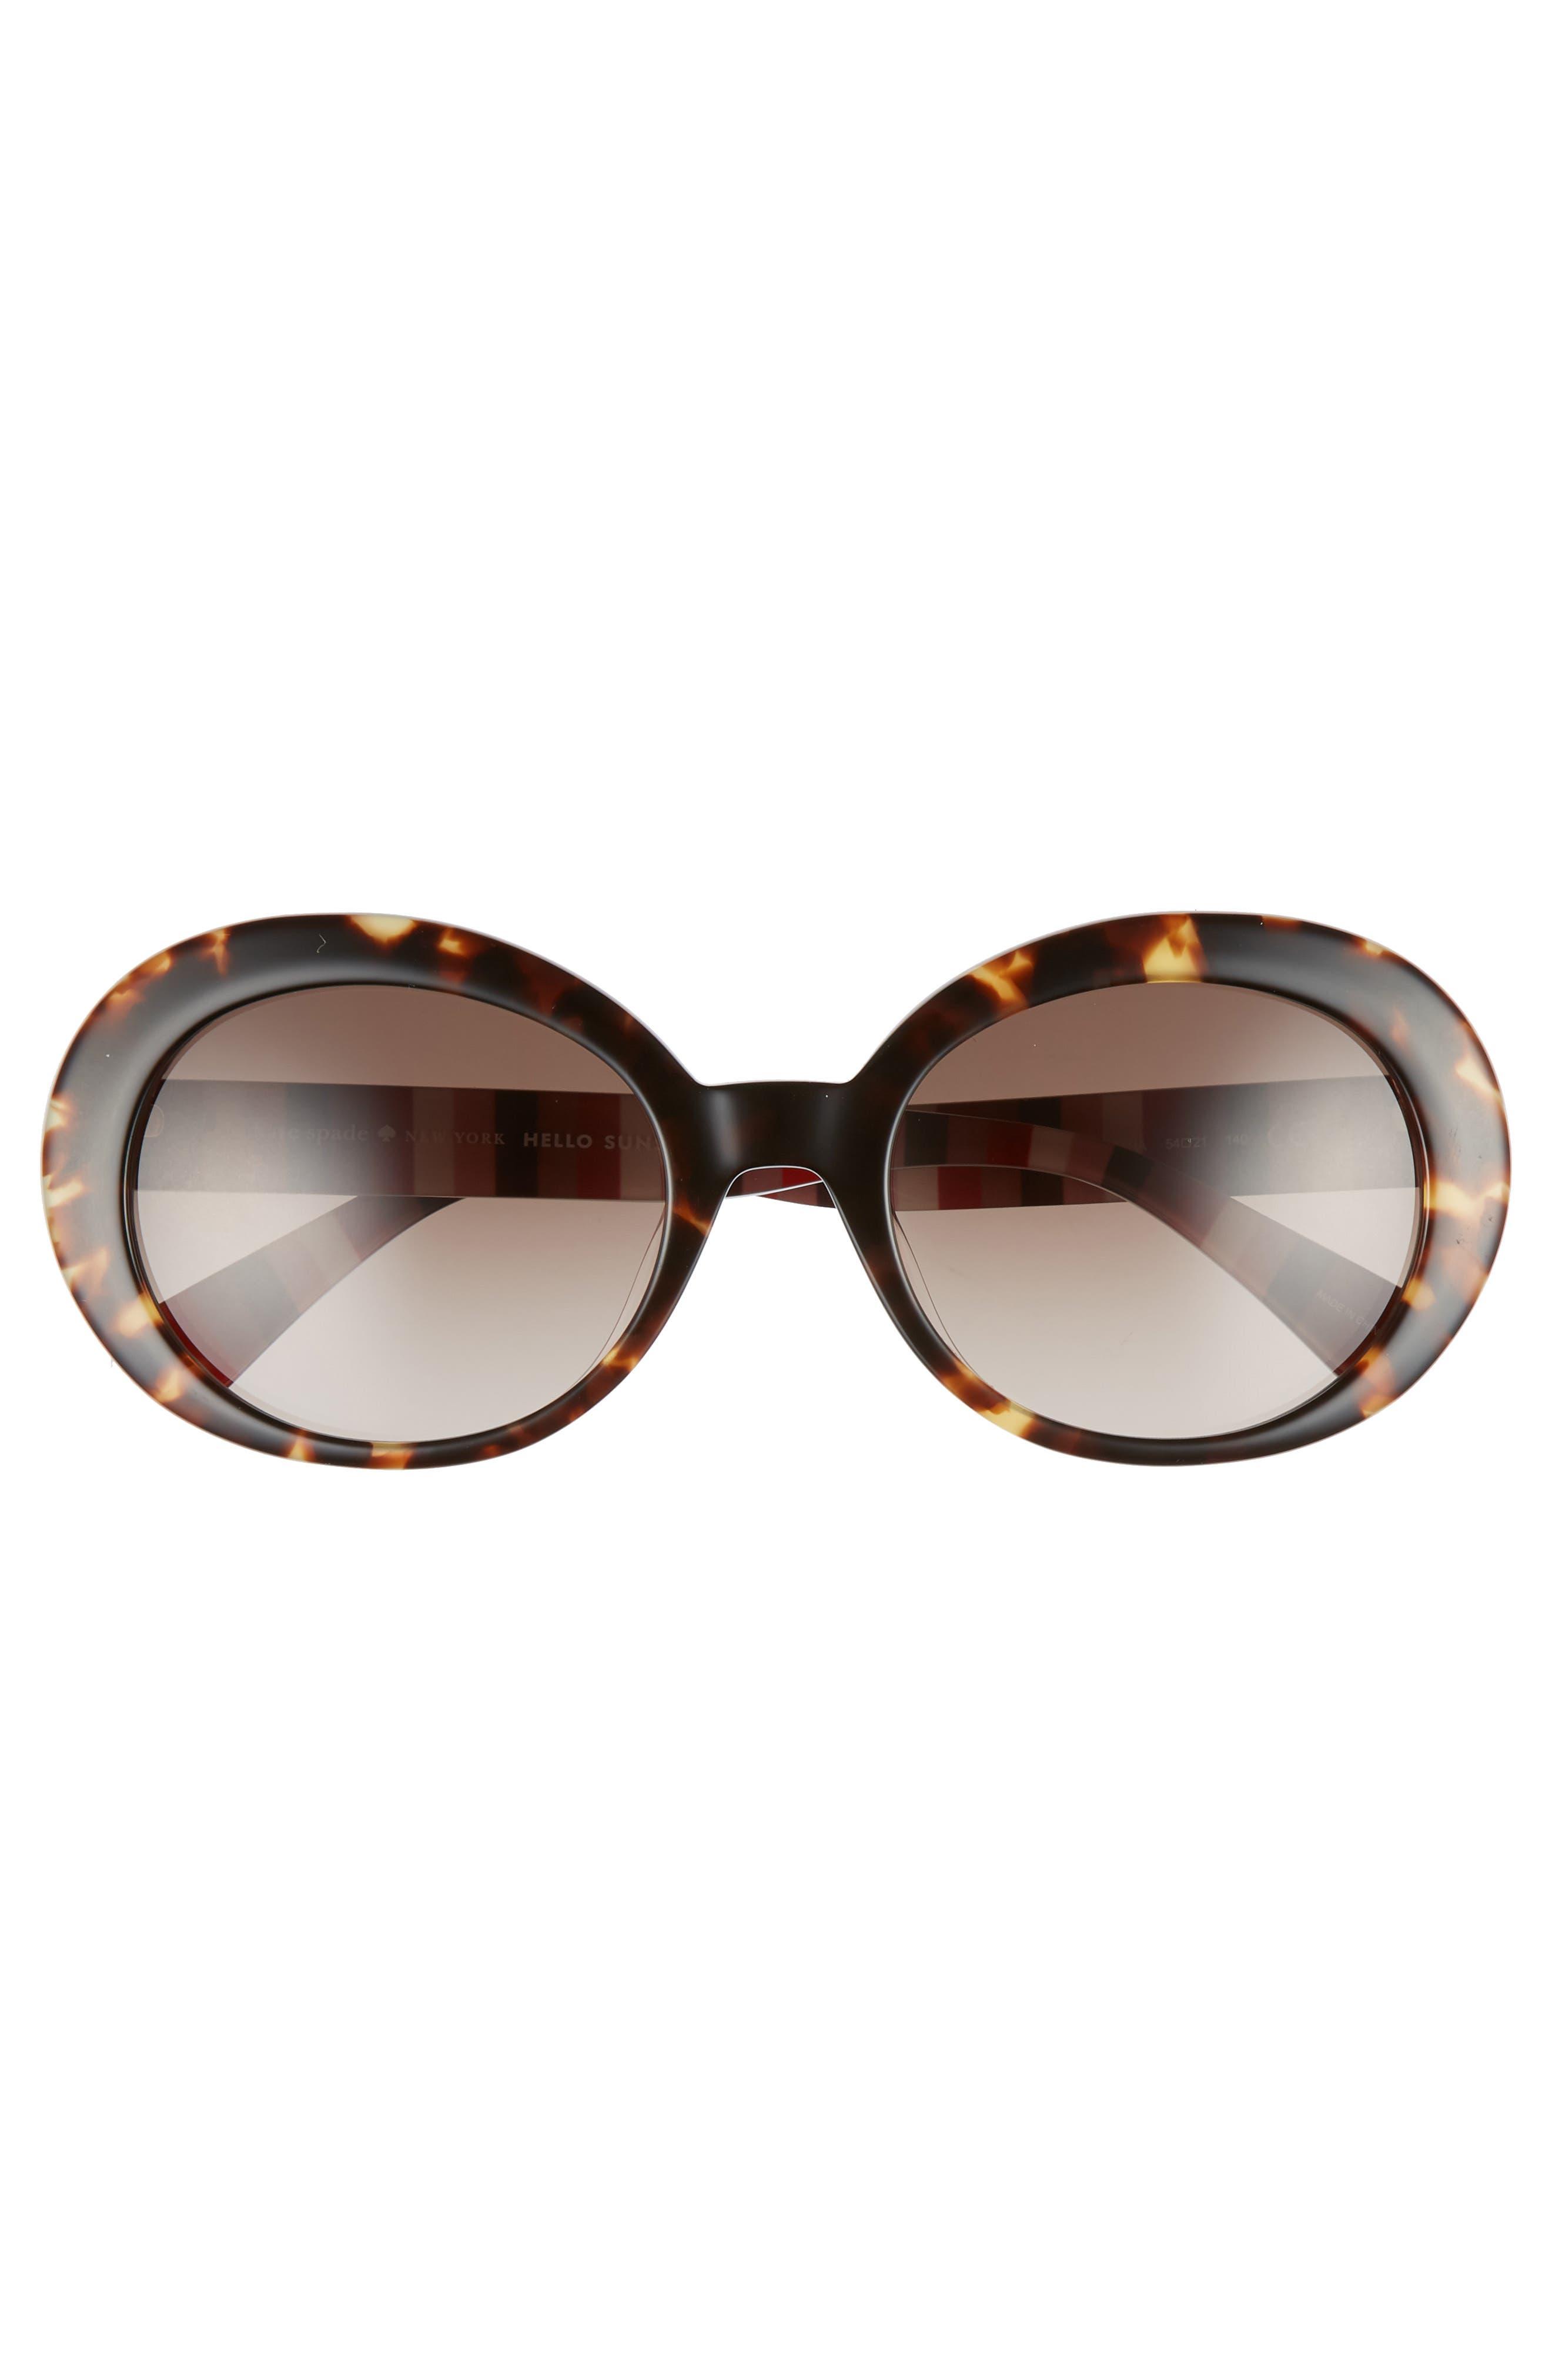 cindra 54mm gradient round sunglasses,                             Alternate thumbnail 3, color,                             DARK HAVANA